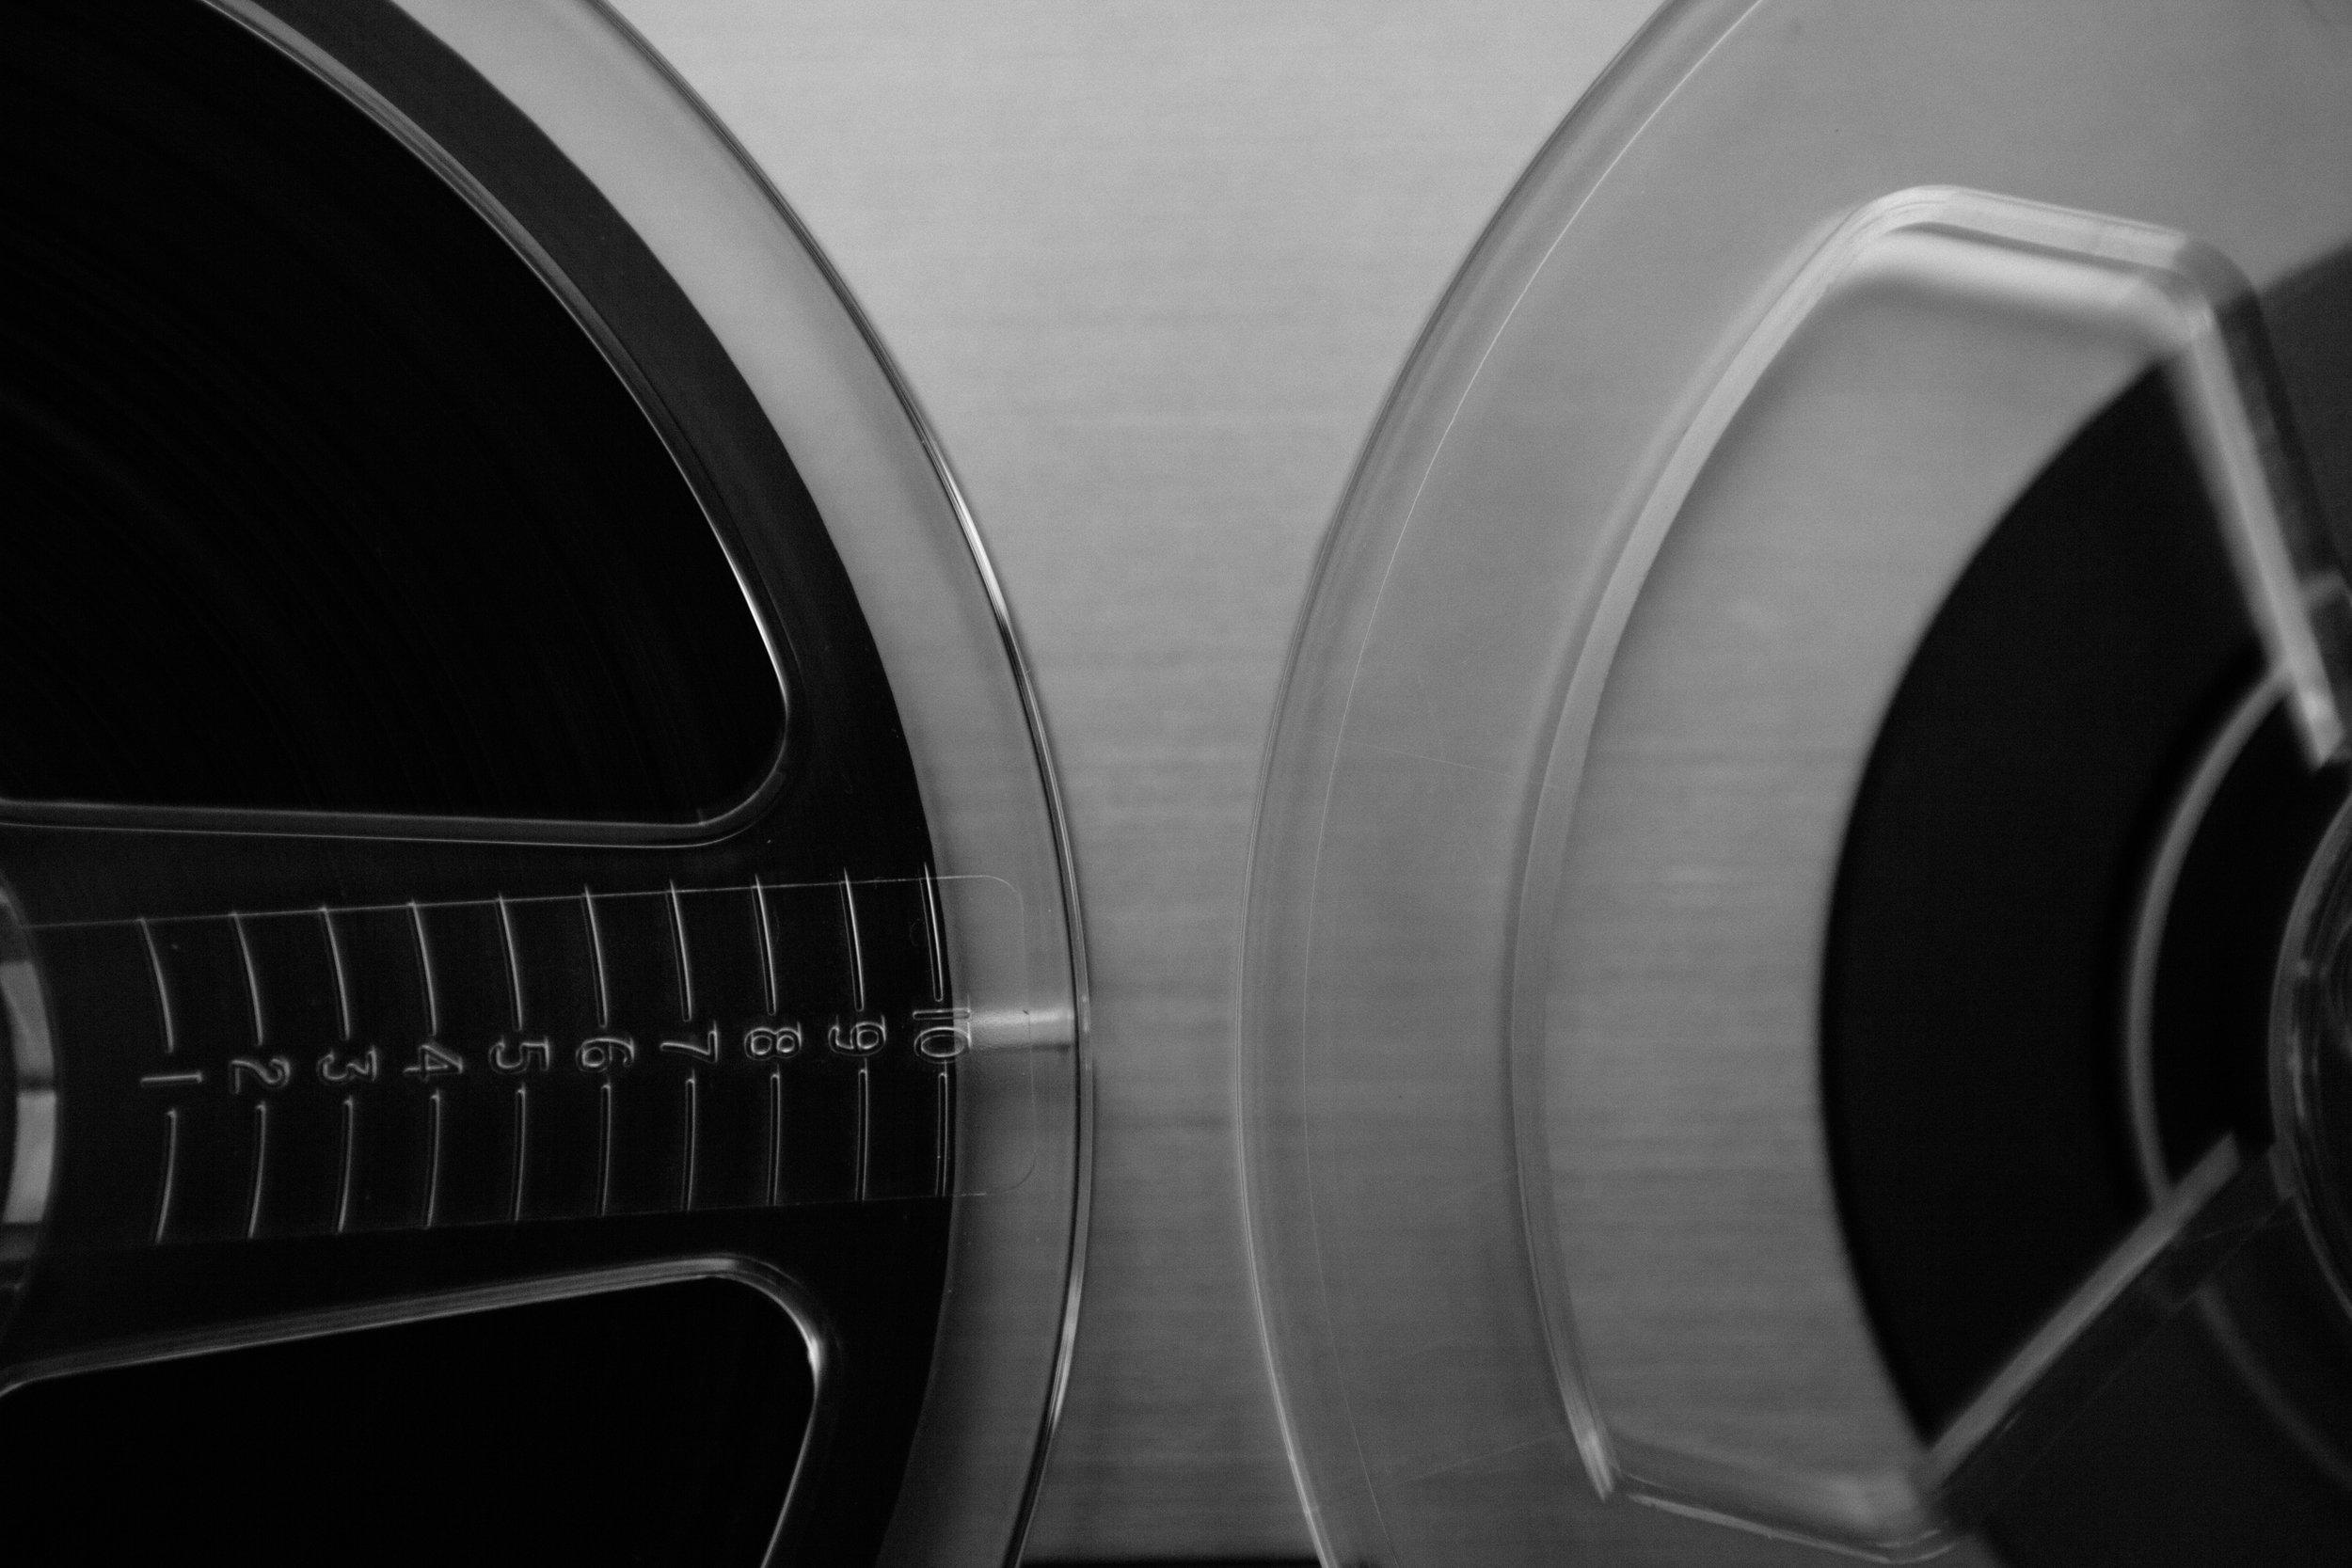 music-sound-audio-recording.jpg